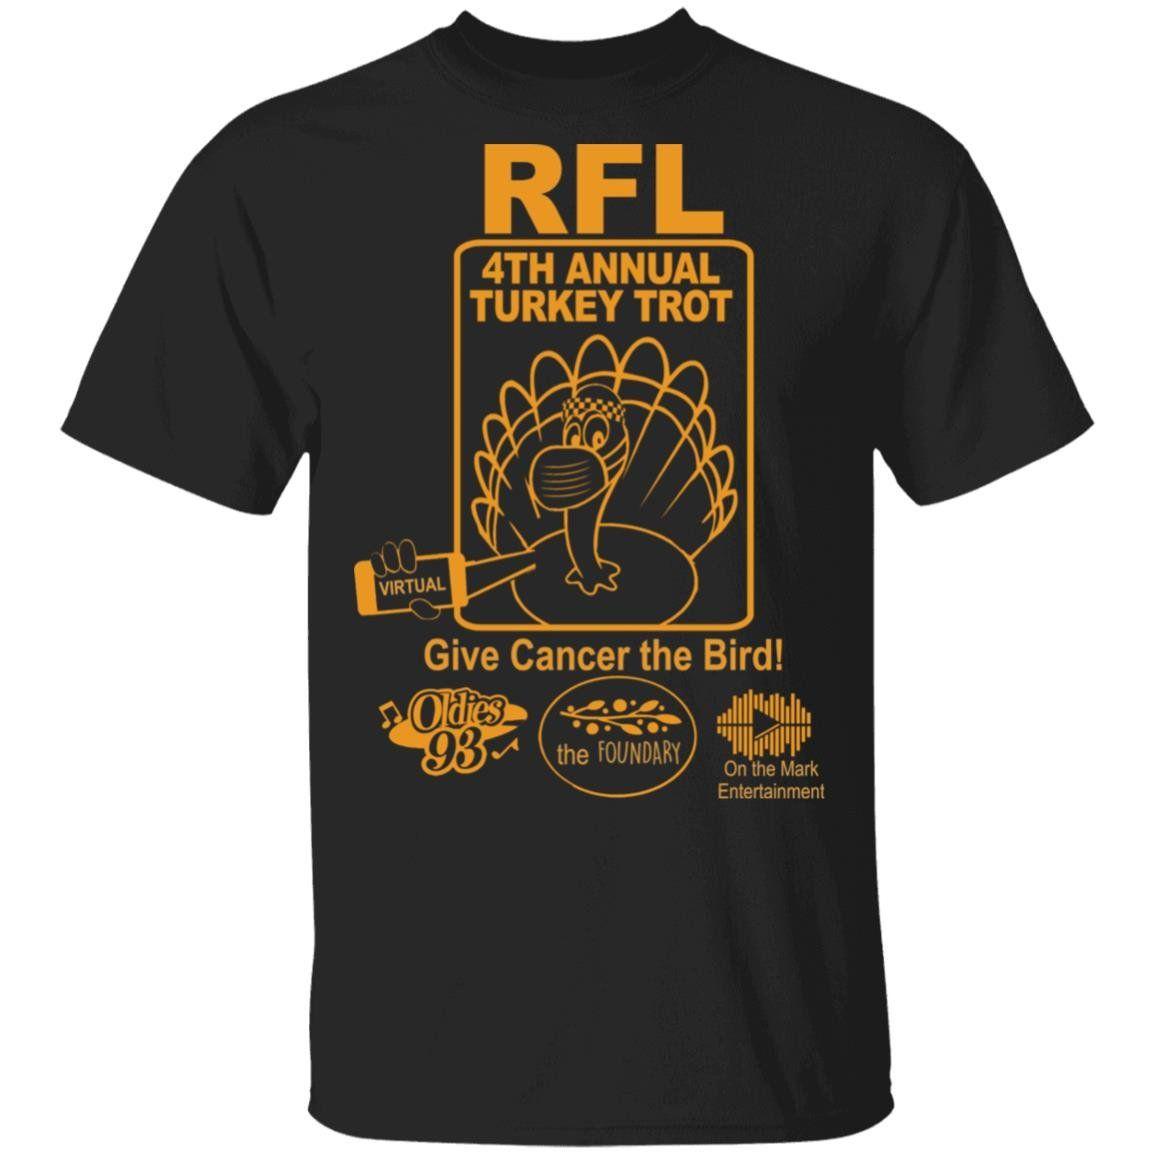 RFL 4th Annual Turkey Trot Give Cancer The Bird Shirt